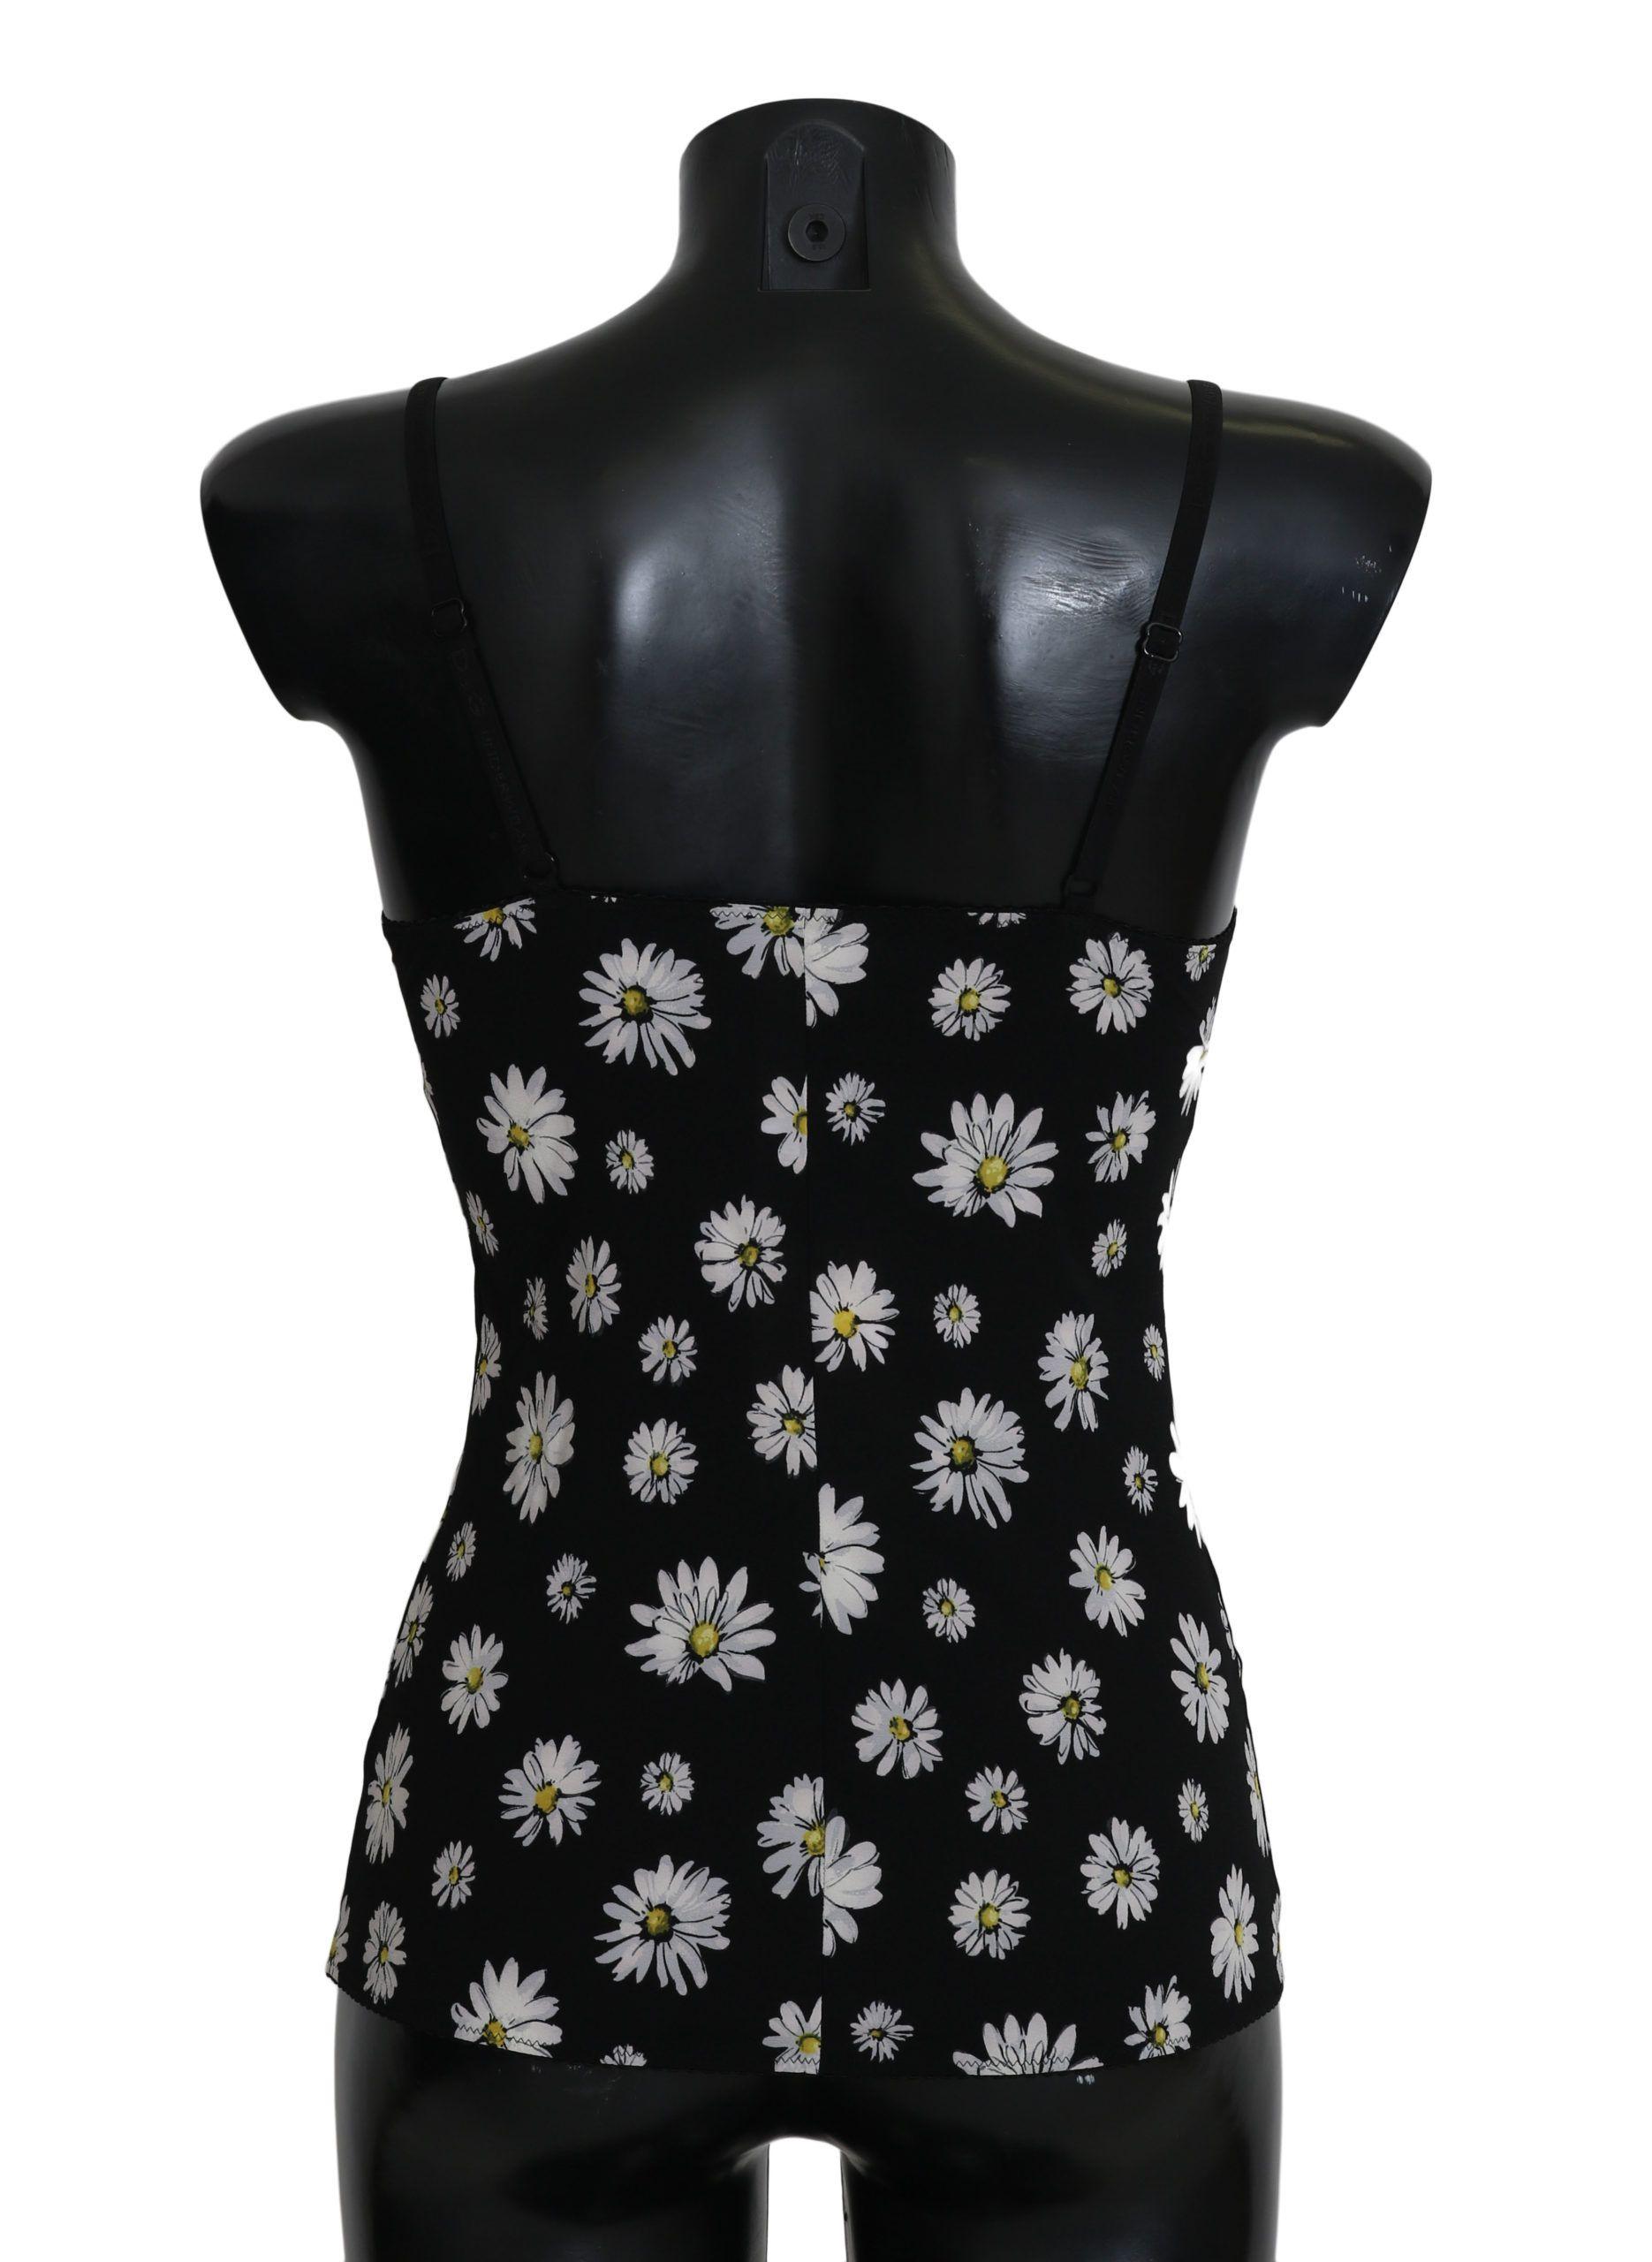 Dolce & Gabbana Black Daisy Print Dress Lingerie Chemisole